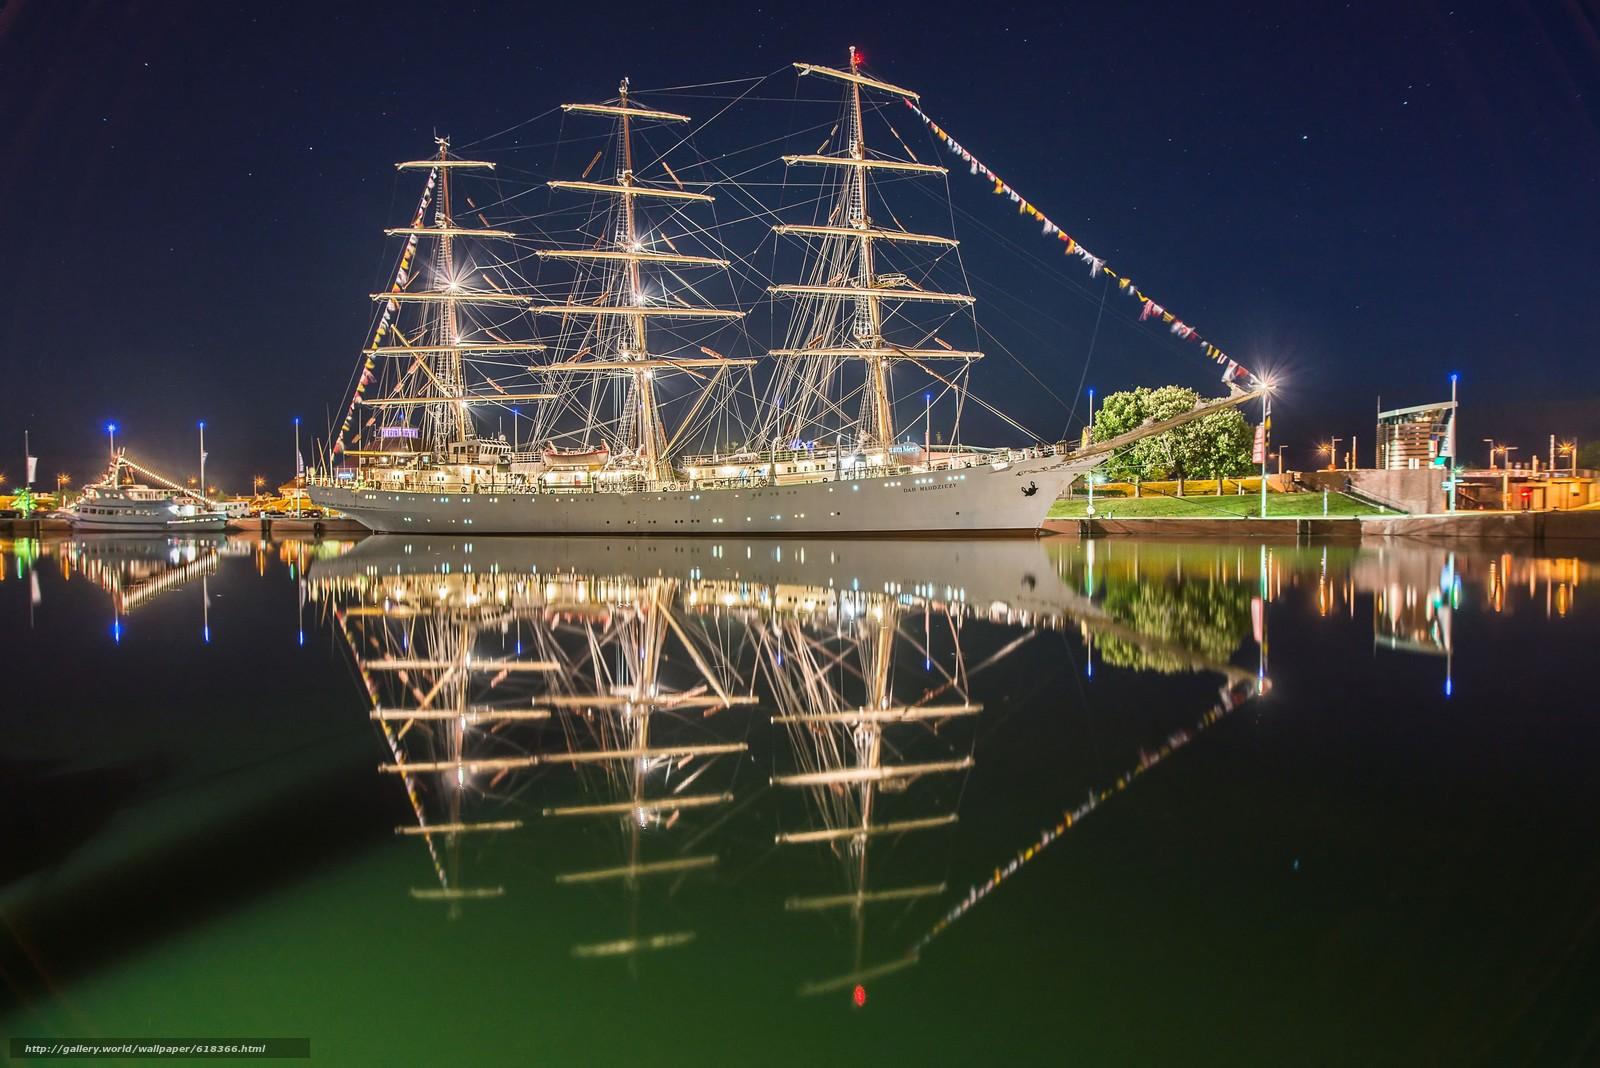 Dar M?odzie?y, Bremerhaven, Germany, Weser River, Дар Молодёжи, Бремерхафен, Германия, река Везер, фрегат, парусник, река, отражение